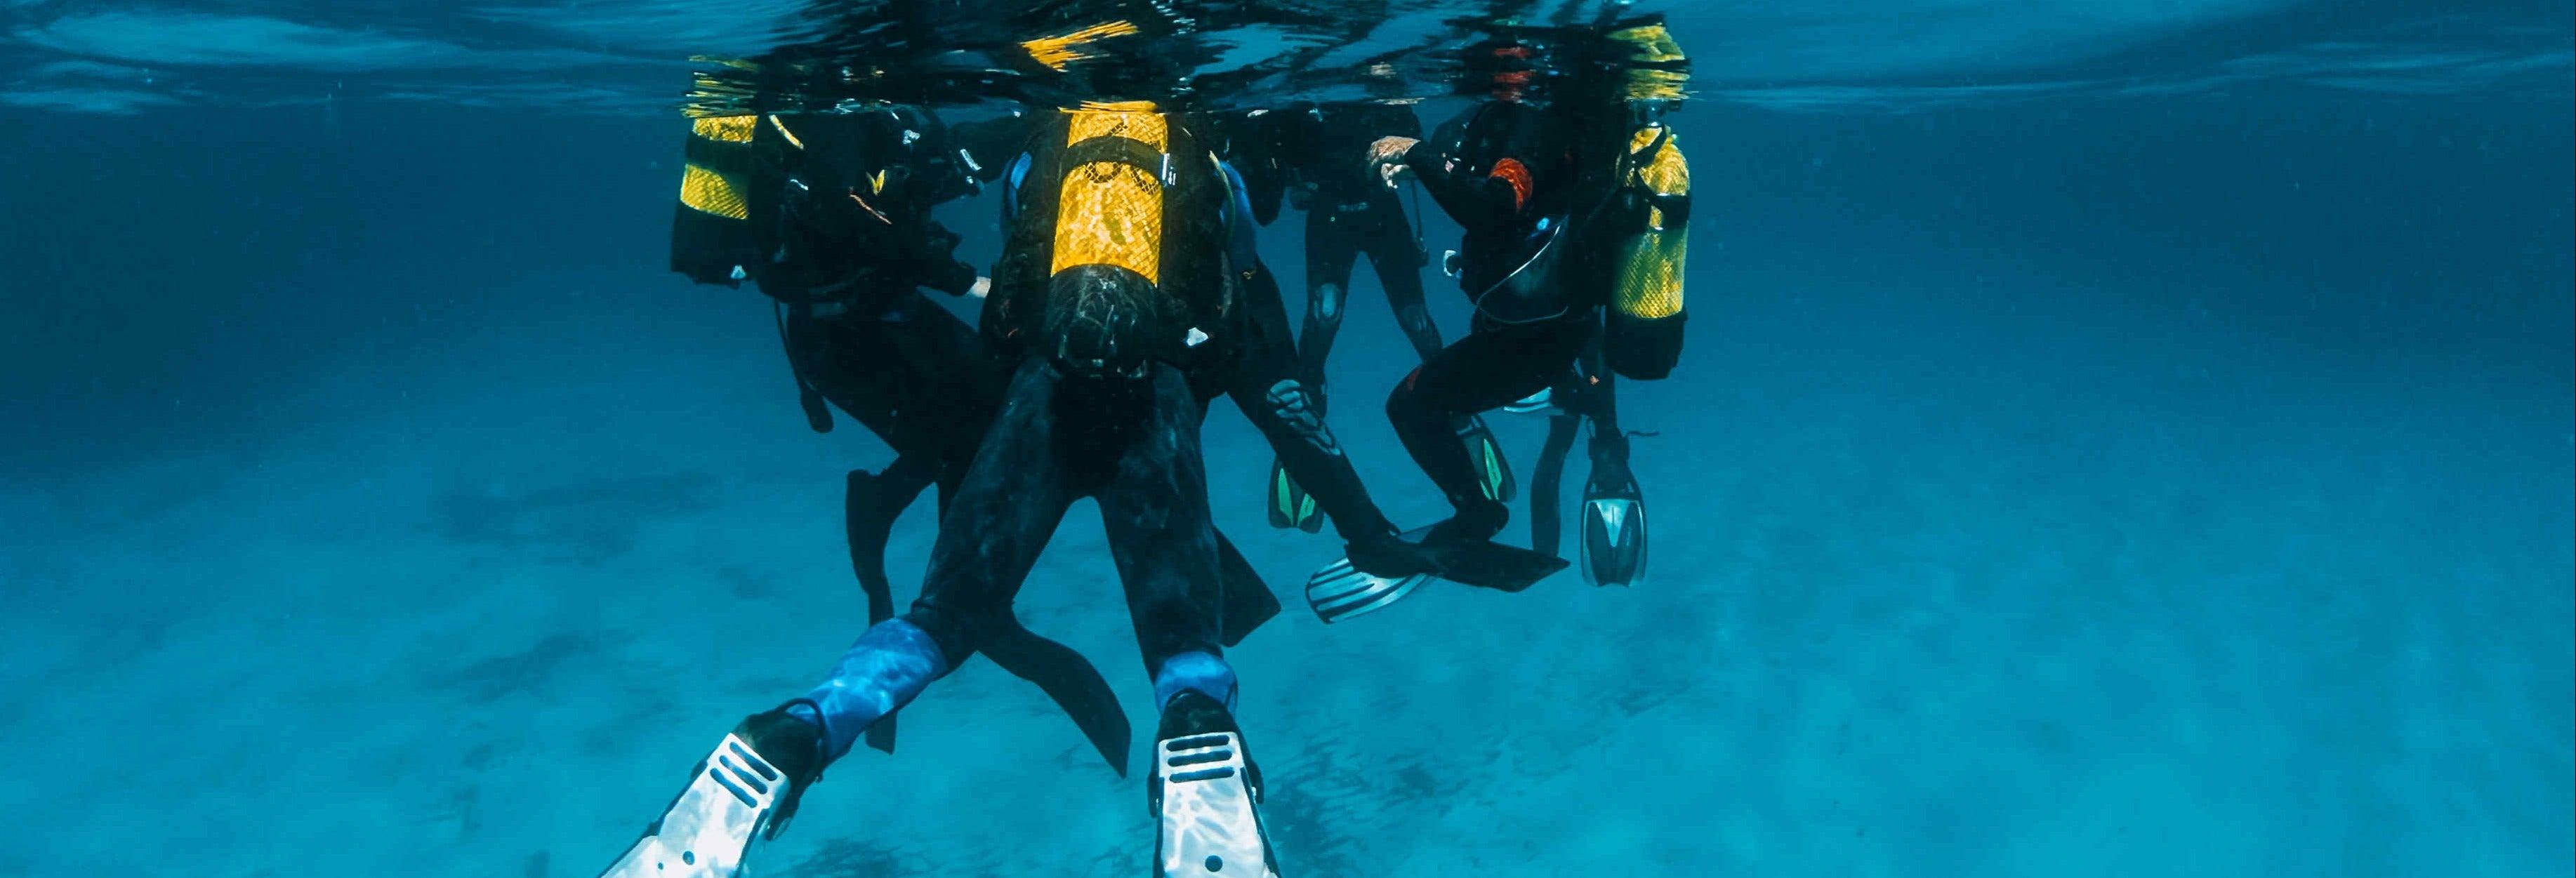 Curso de mergulho PADI Open Water em Port d'Addaia